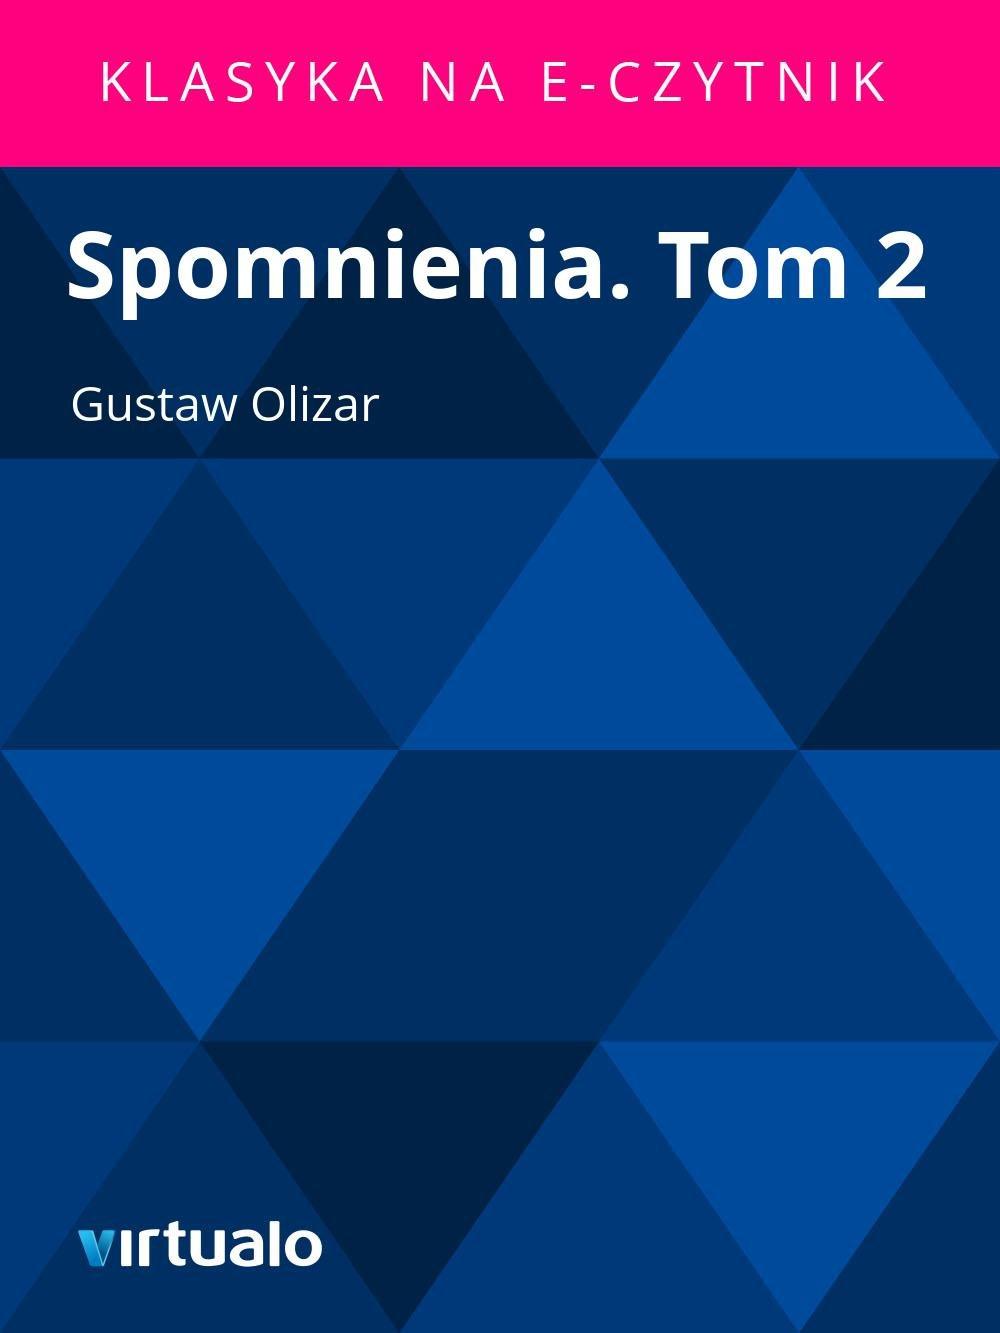 Spomnienia. Tom 2 - Ebook (Książka EPUB) do pobrania w formacie EPUB